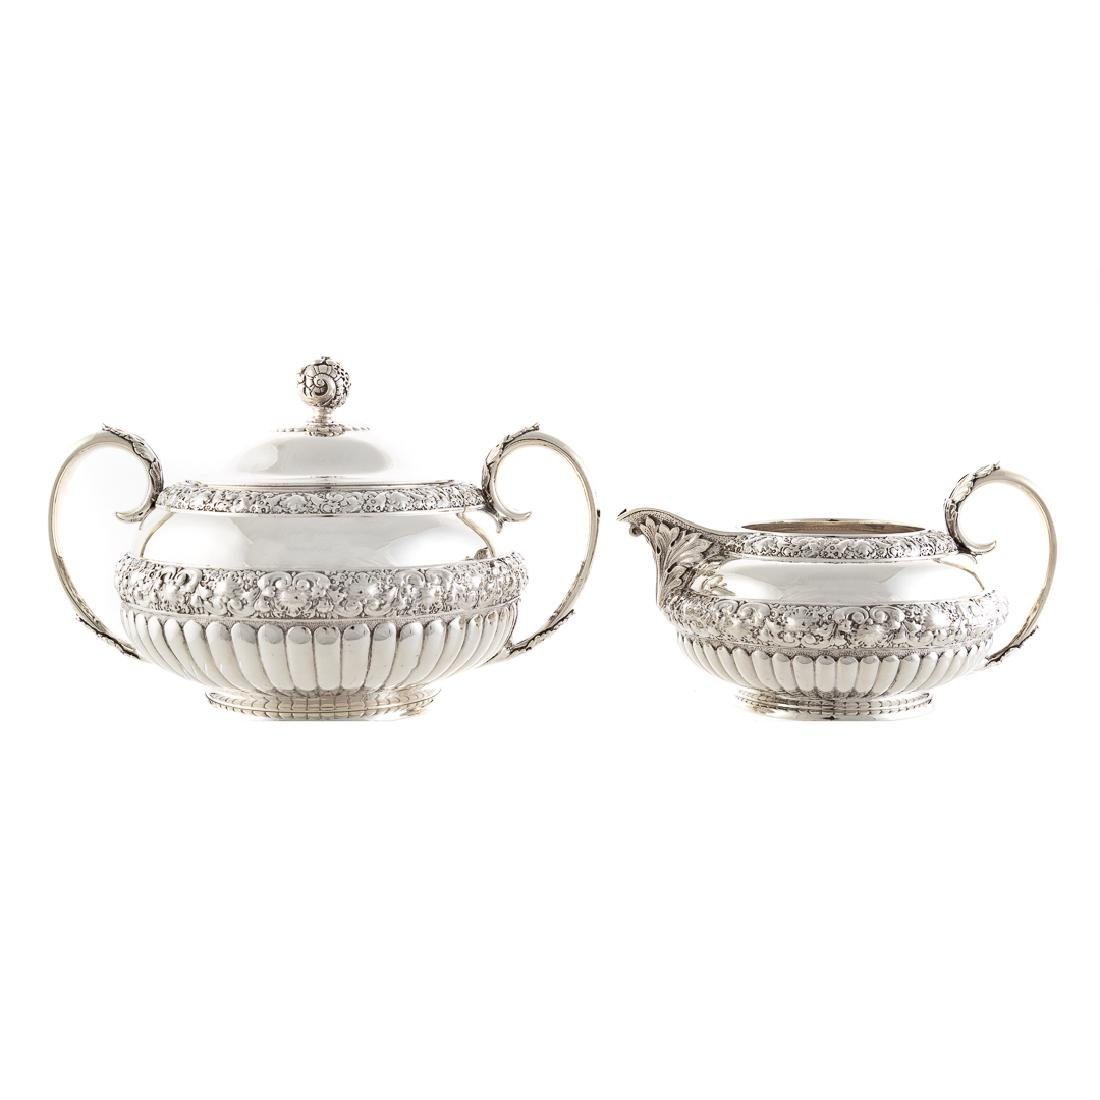 Very fine Tiffany sterling coffee & tea service - 8